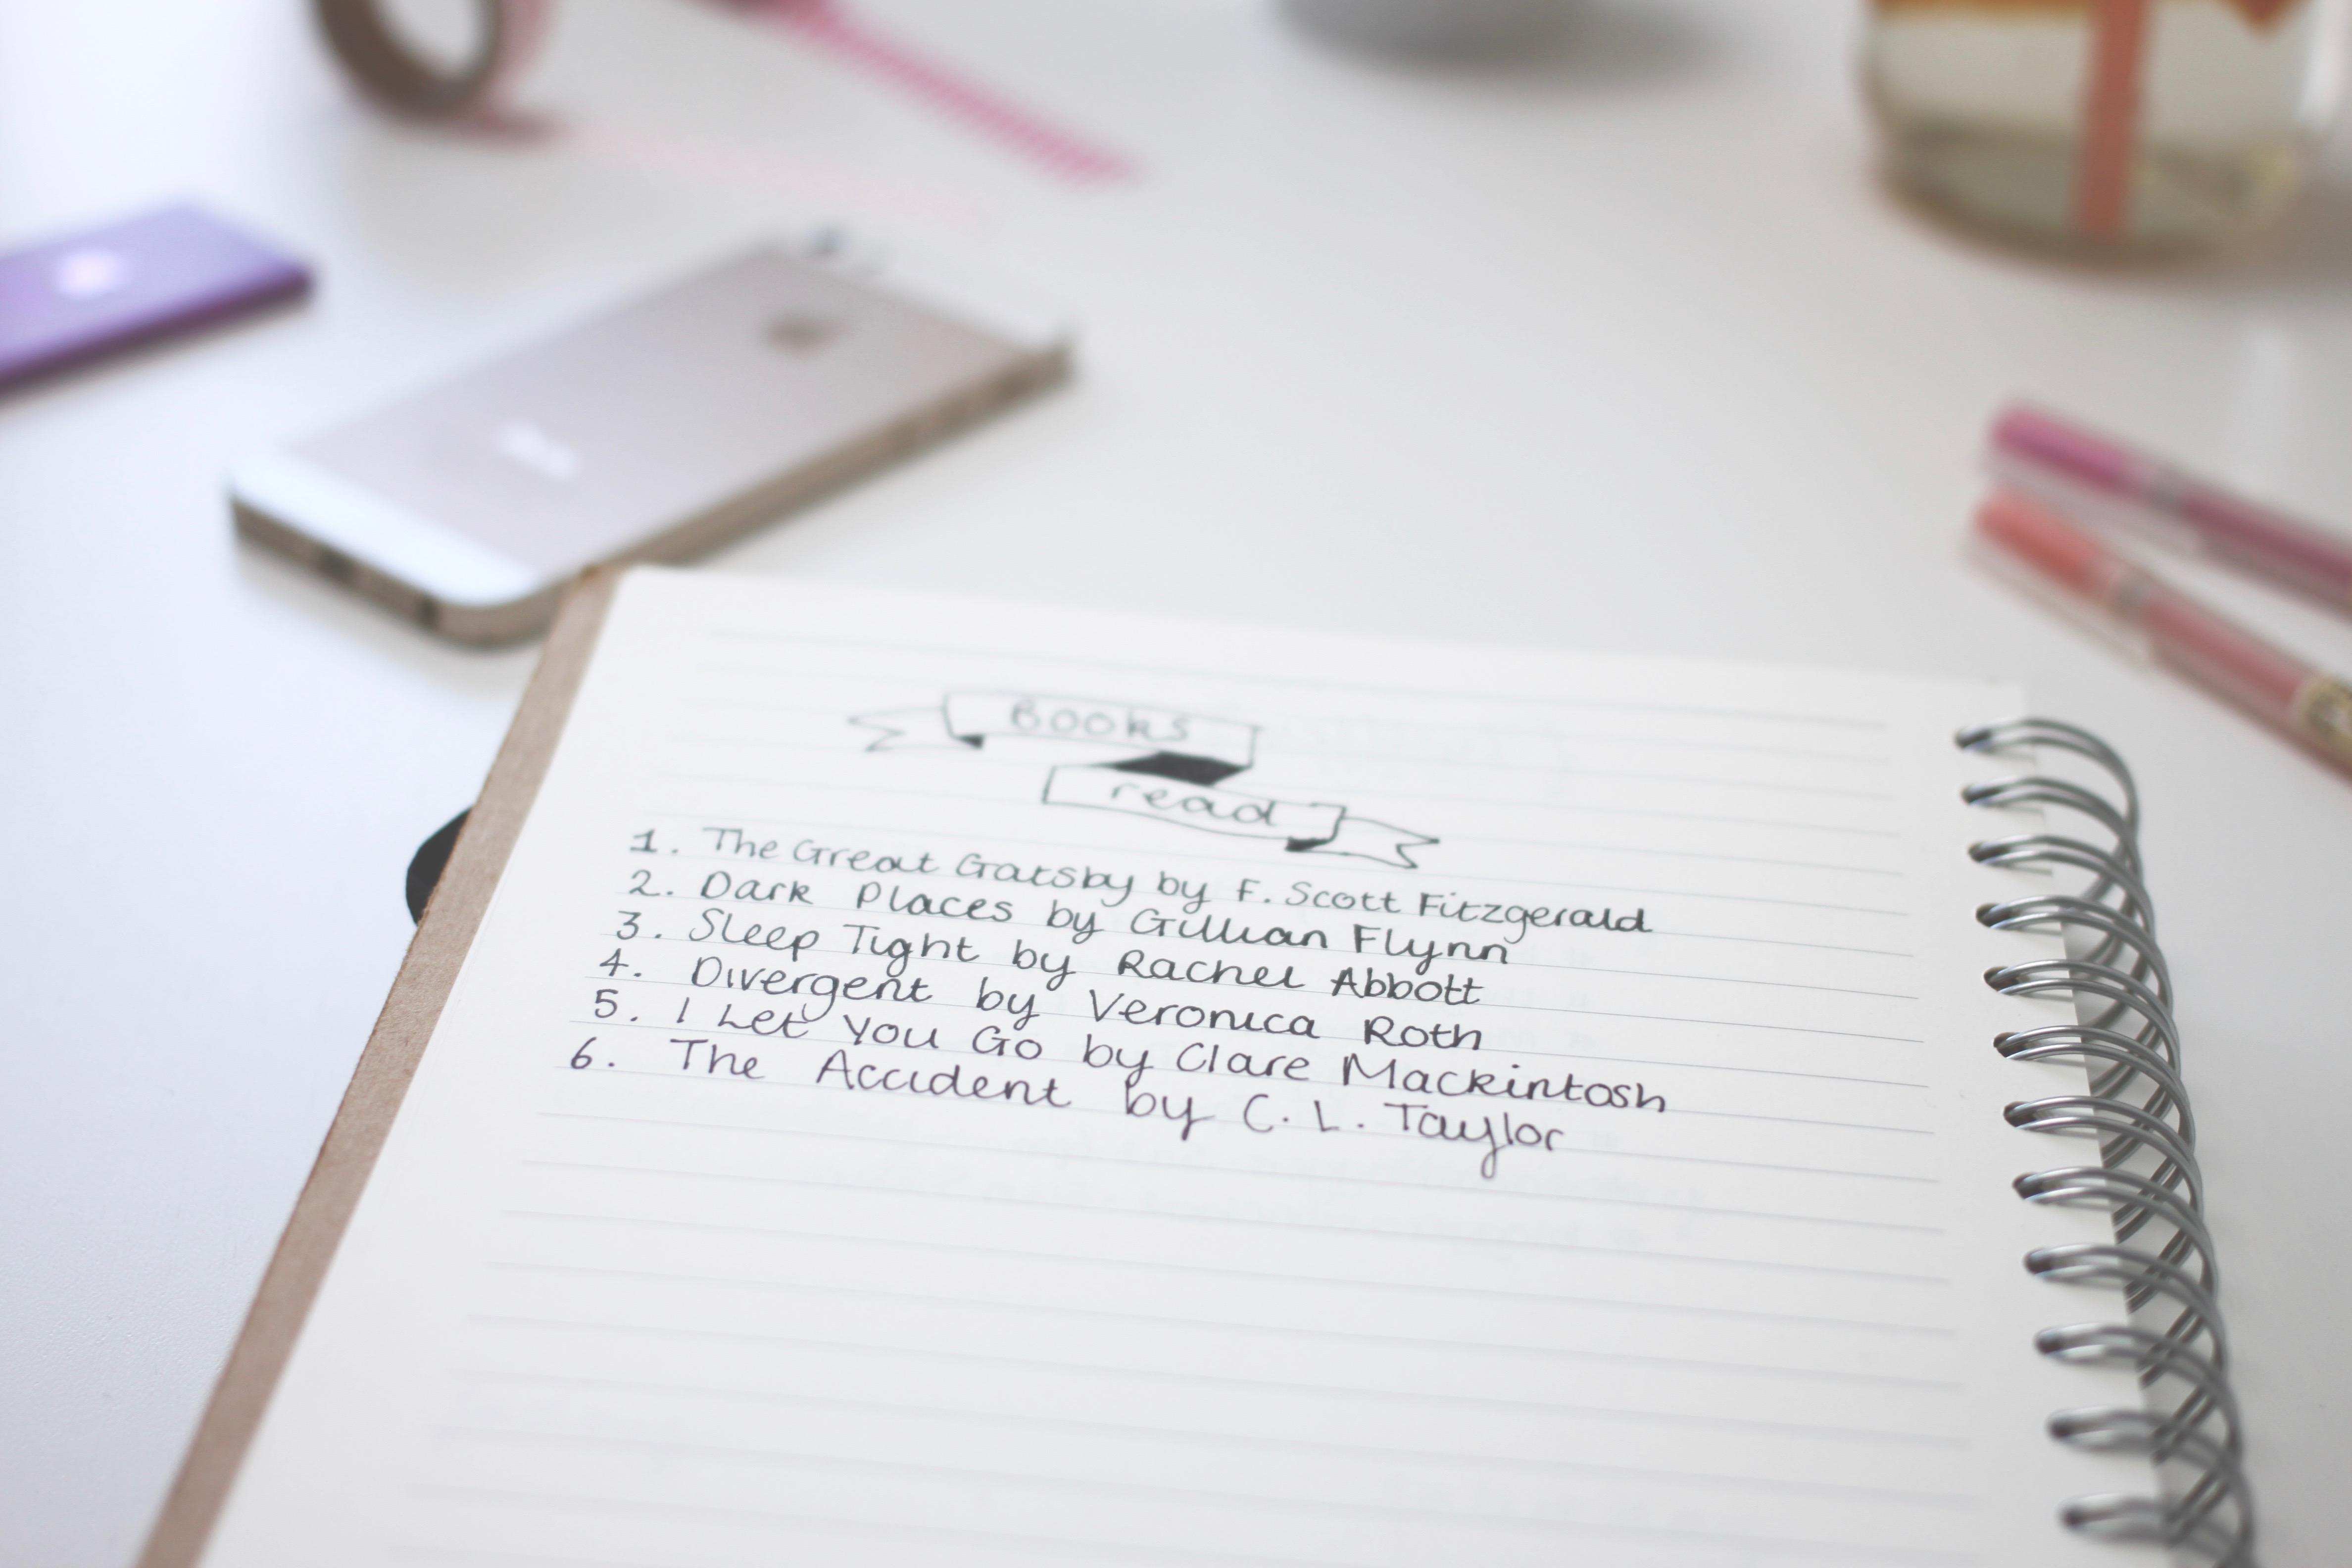 Bullet Journal - 50 Page Ideas | www.hannahemilylane.com - A student lifestyle blog